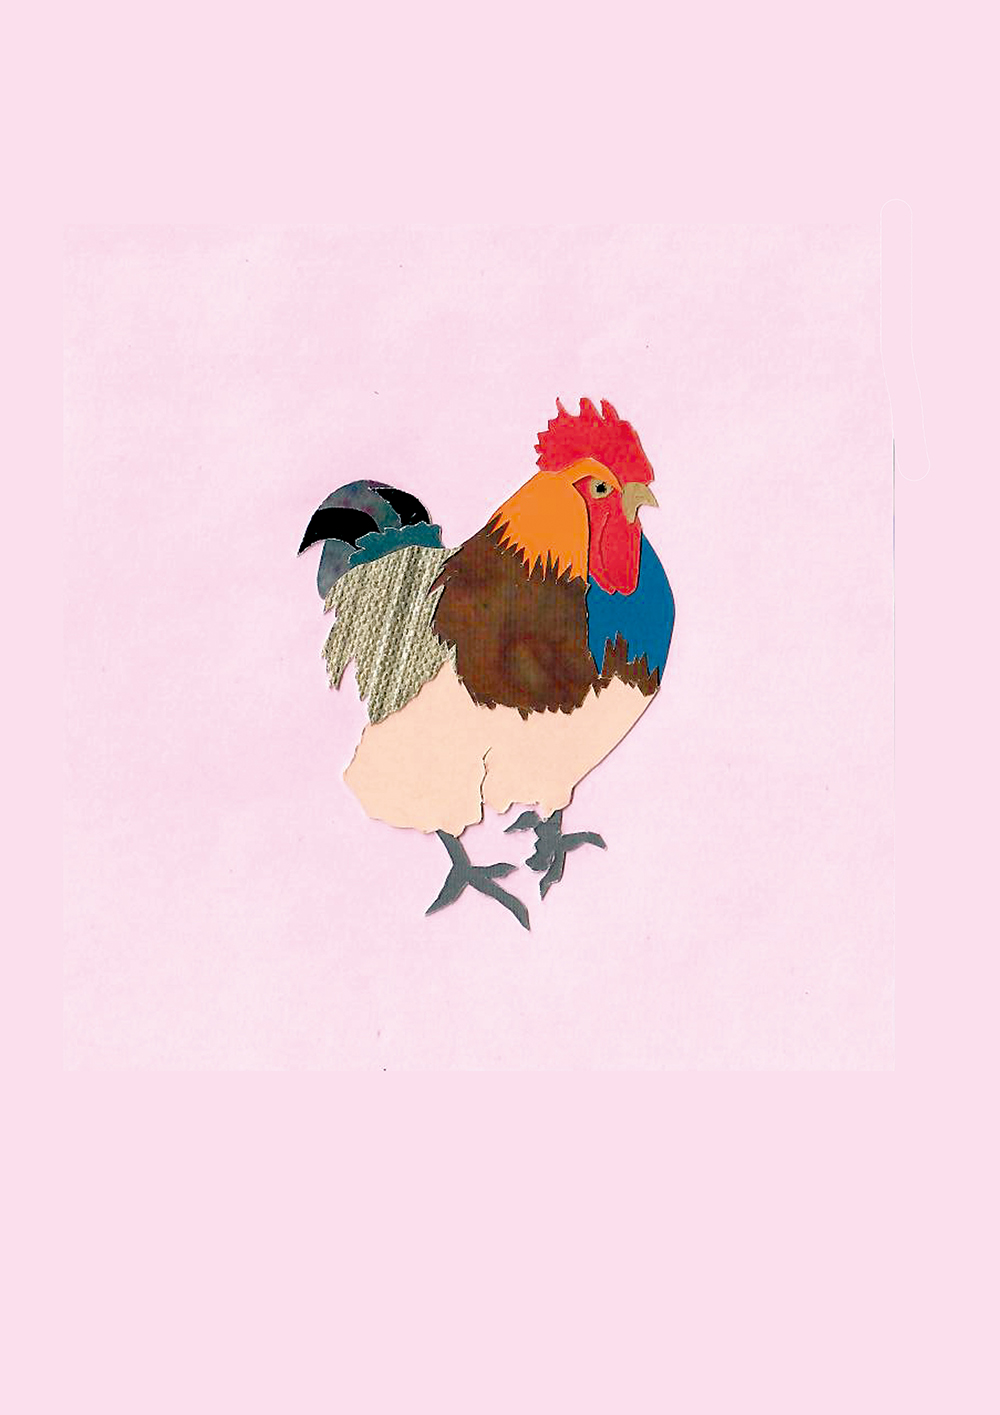 Studiocooliejoelie-karinmol-illustratie-papier-paperart